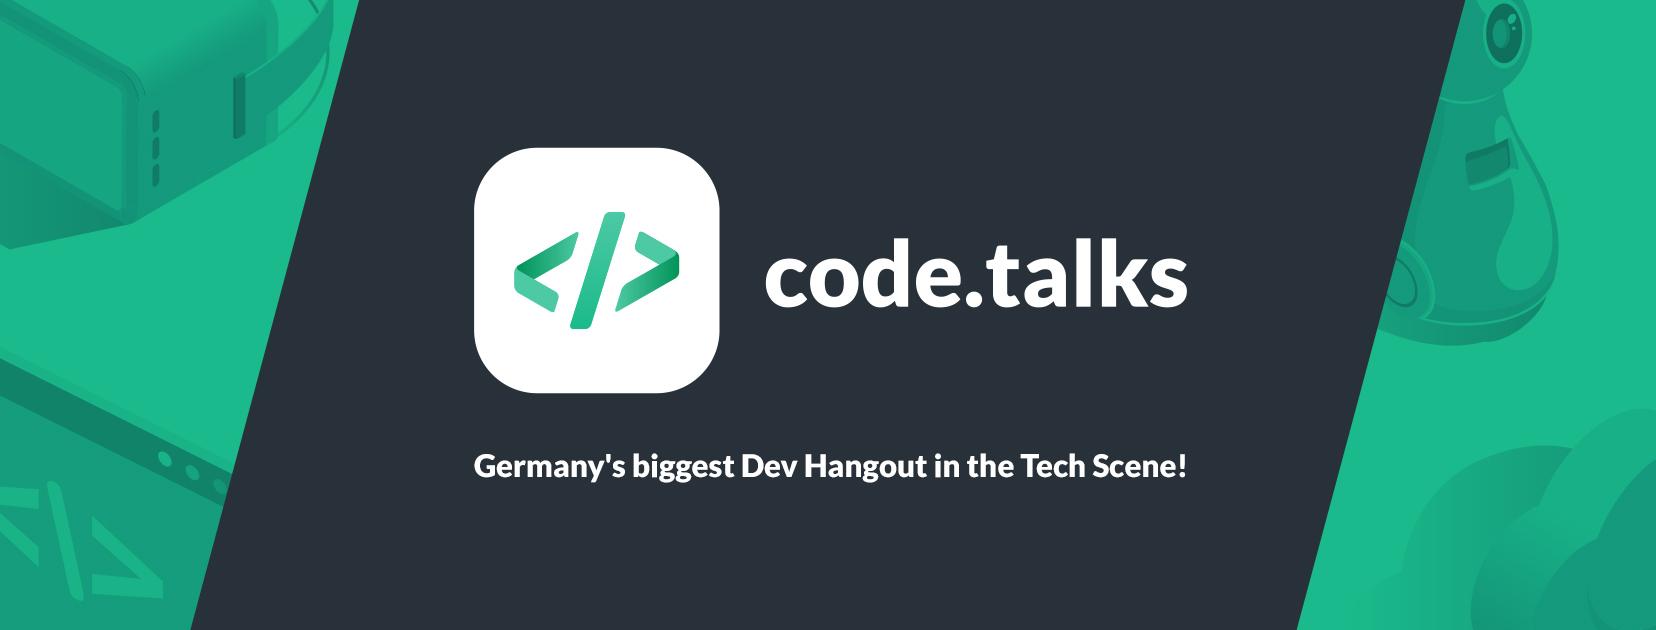 code.talks 2019